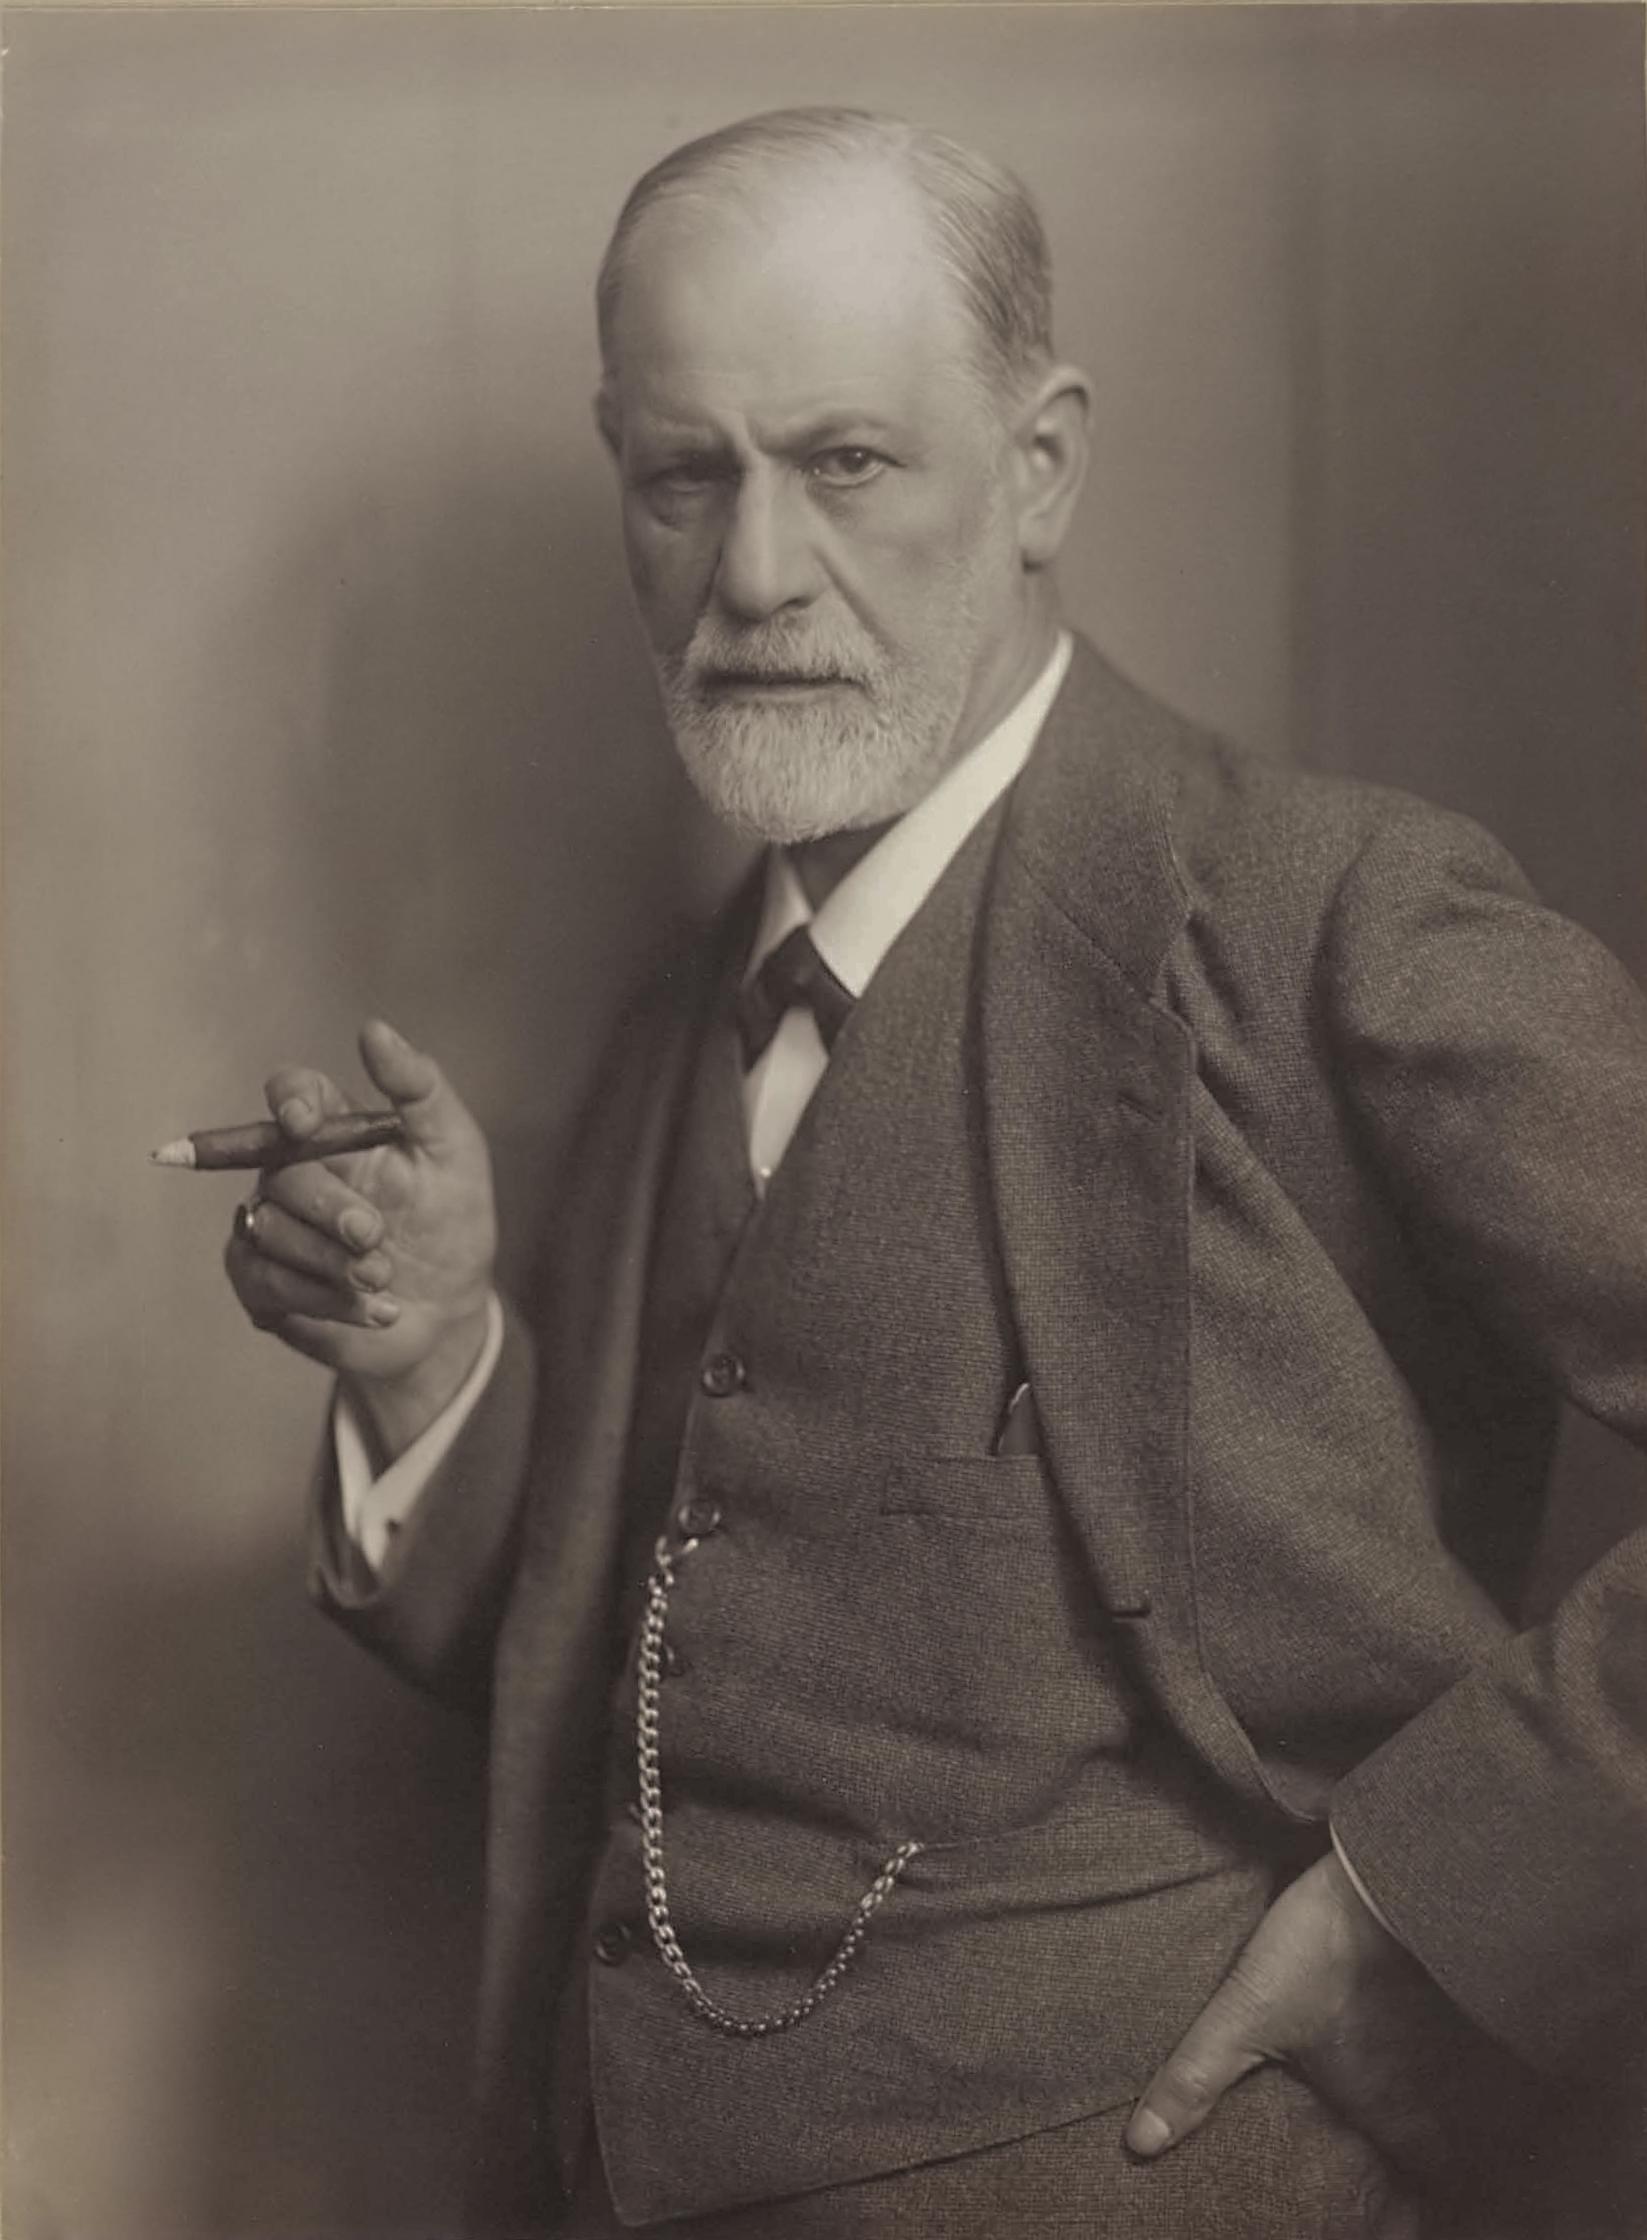 Sigmund Freud, trade show consultant